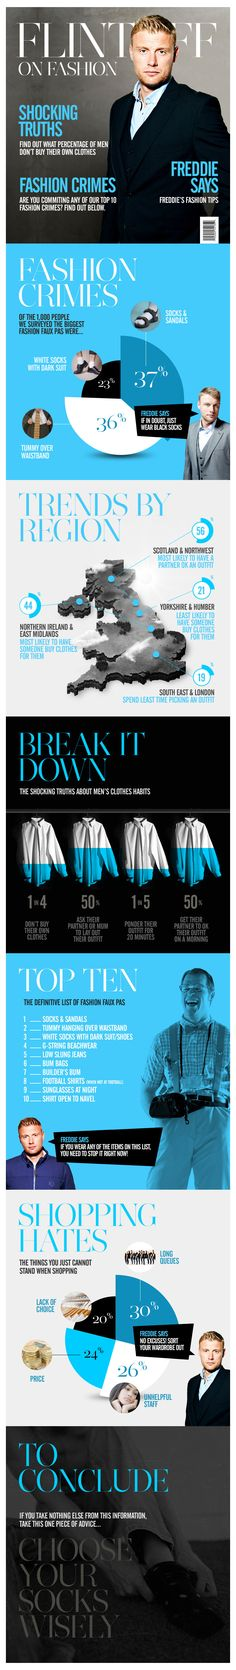 Freddie Flintoff's Fashion Faux Pas